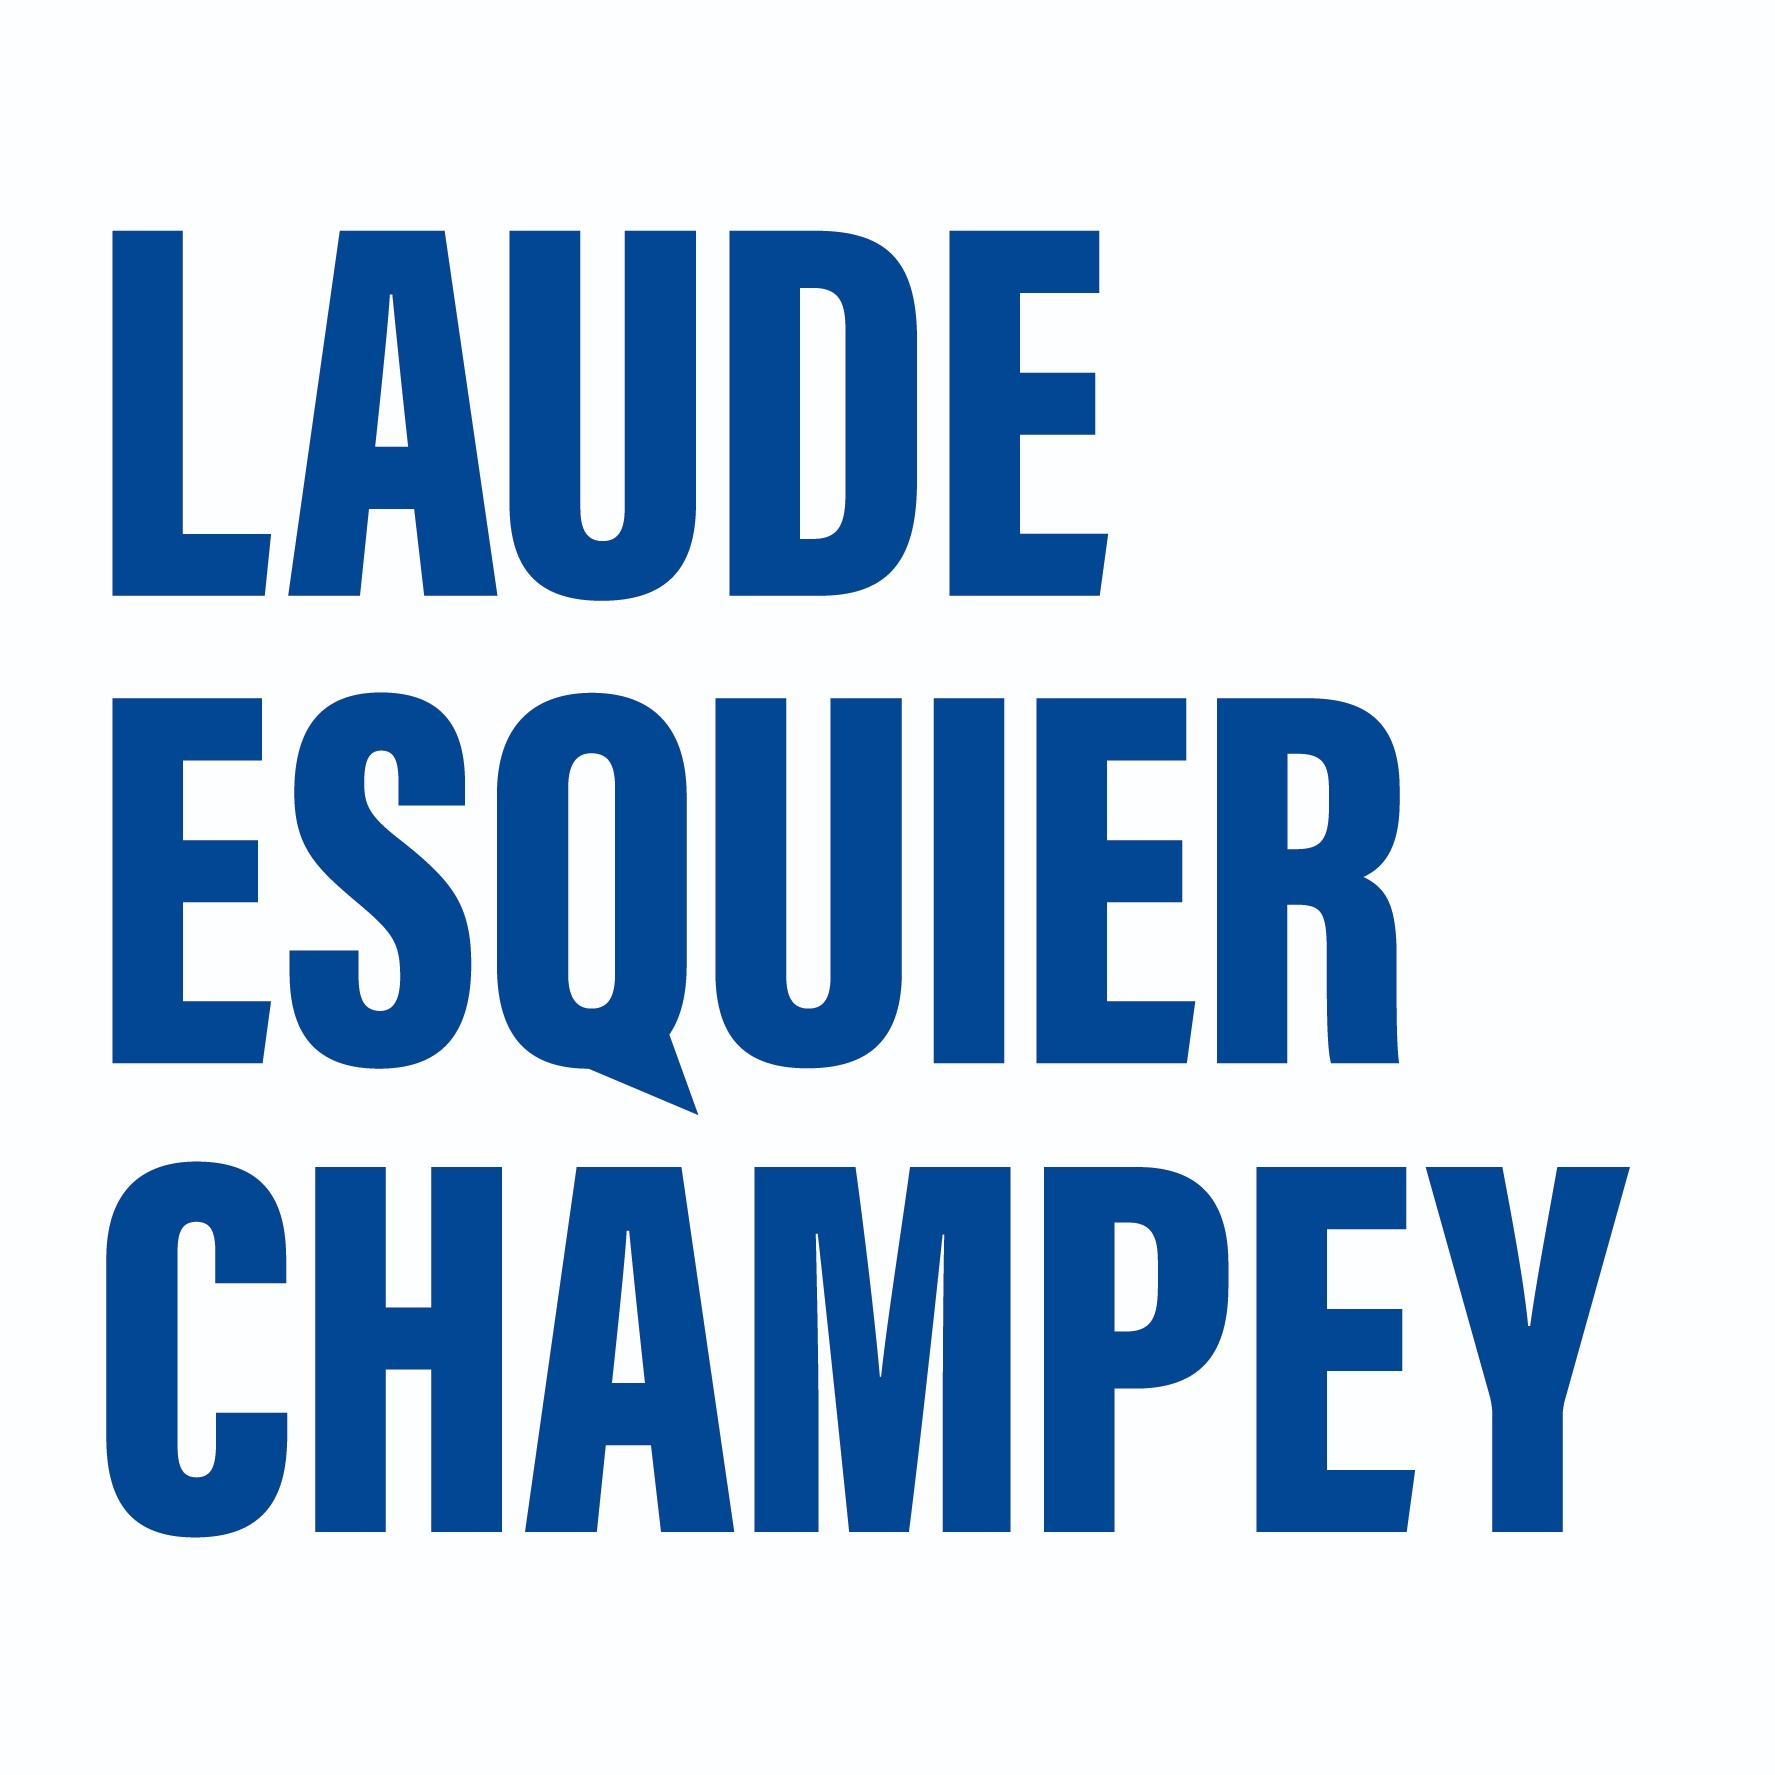 the Laude Esquier Champey logo.